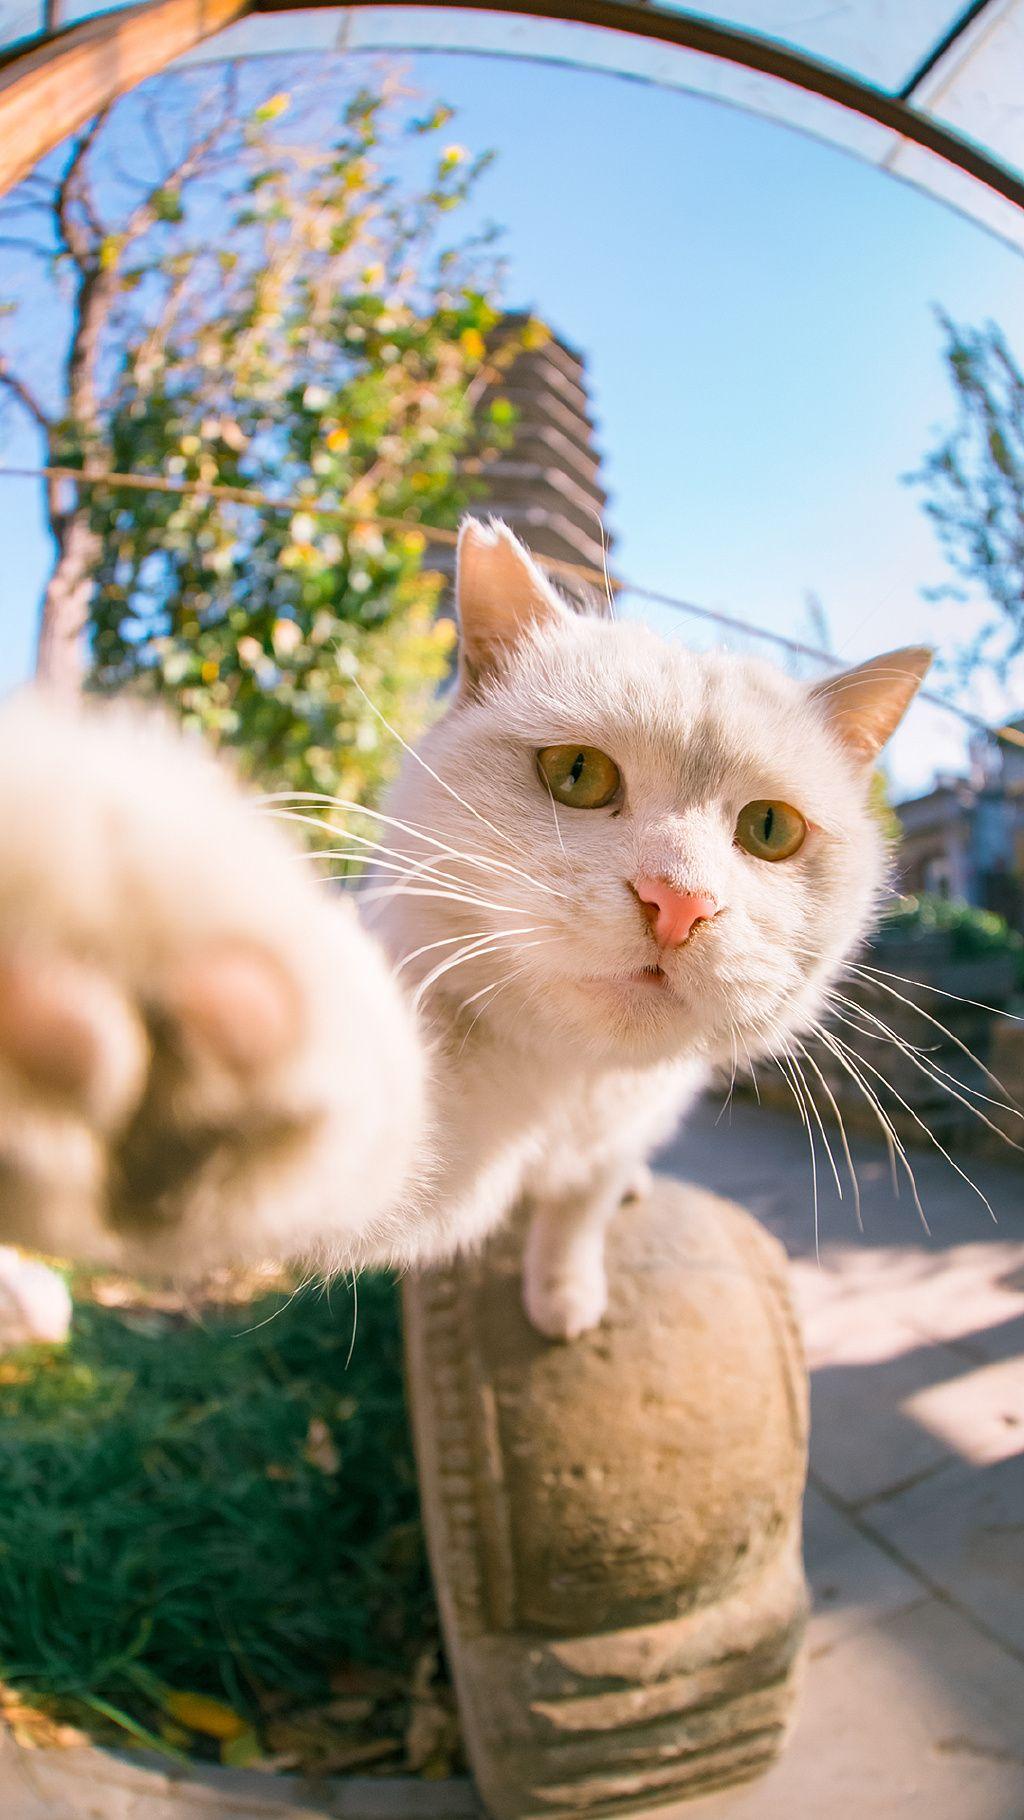 Let Me Take A Selfie Gatitos Lindos Gatos Animales Hermosos